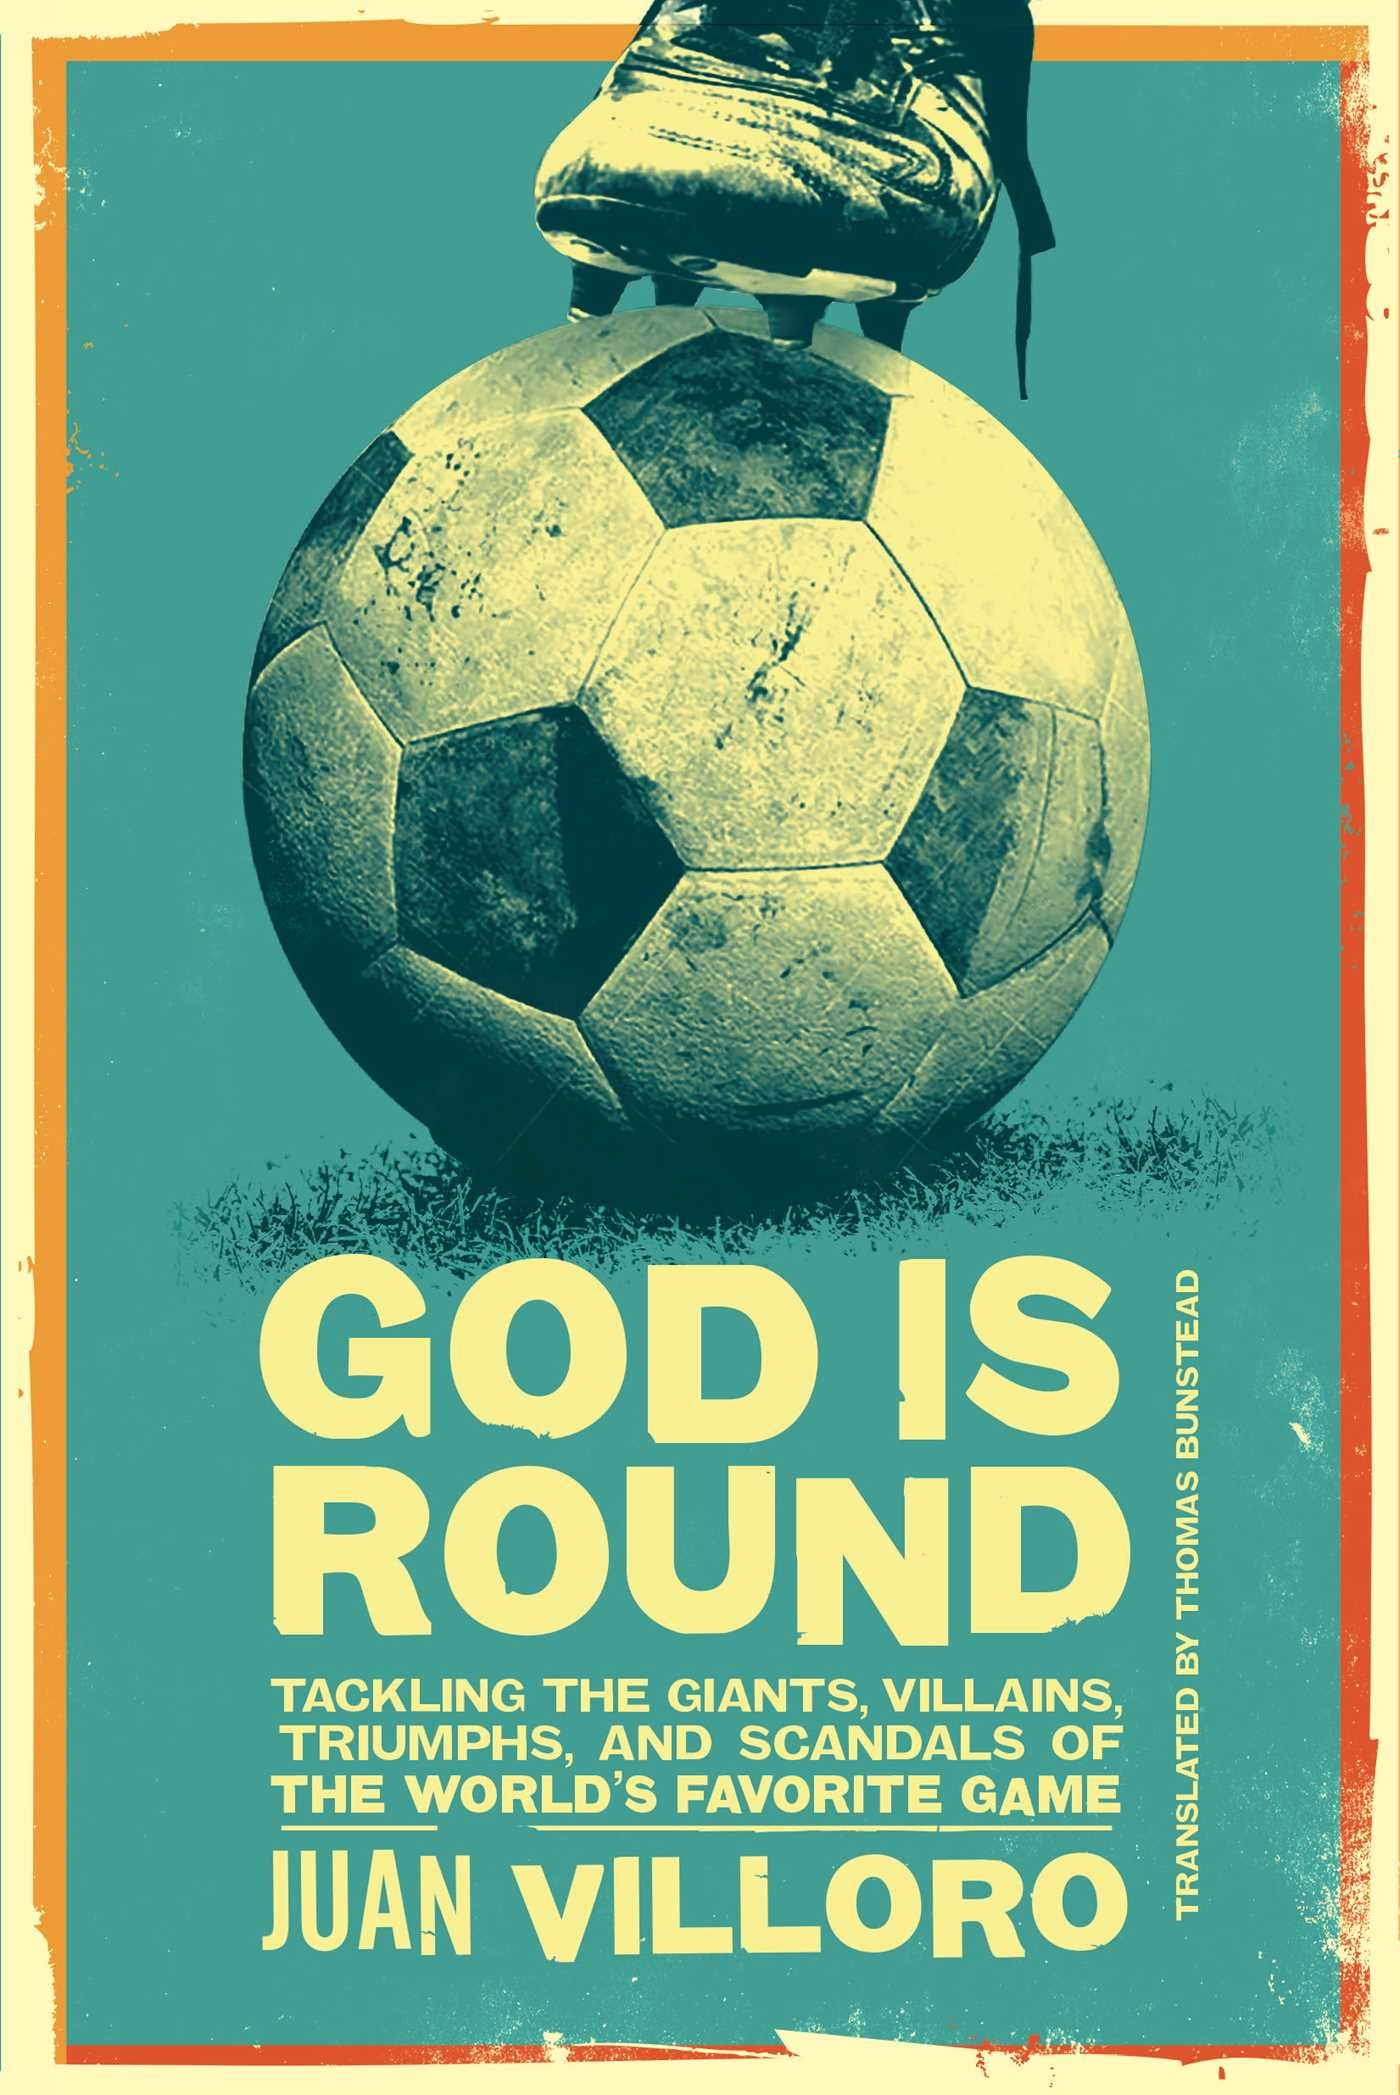 God Is Round: Amazon.es: Juan Villoro, Thomas Bunstead: Libros en idiomas extranjeros